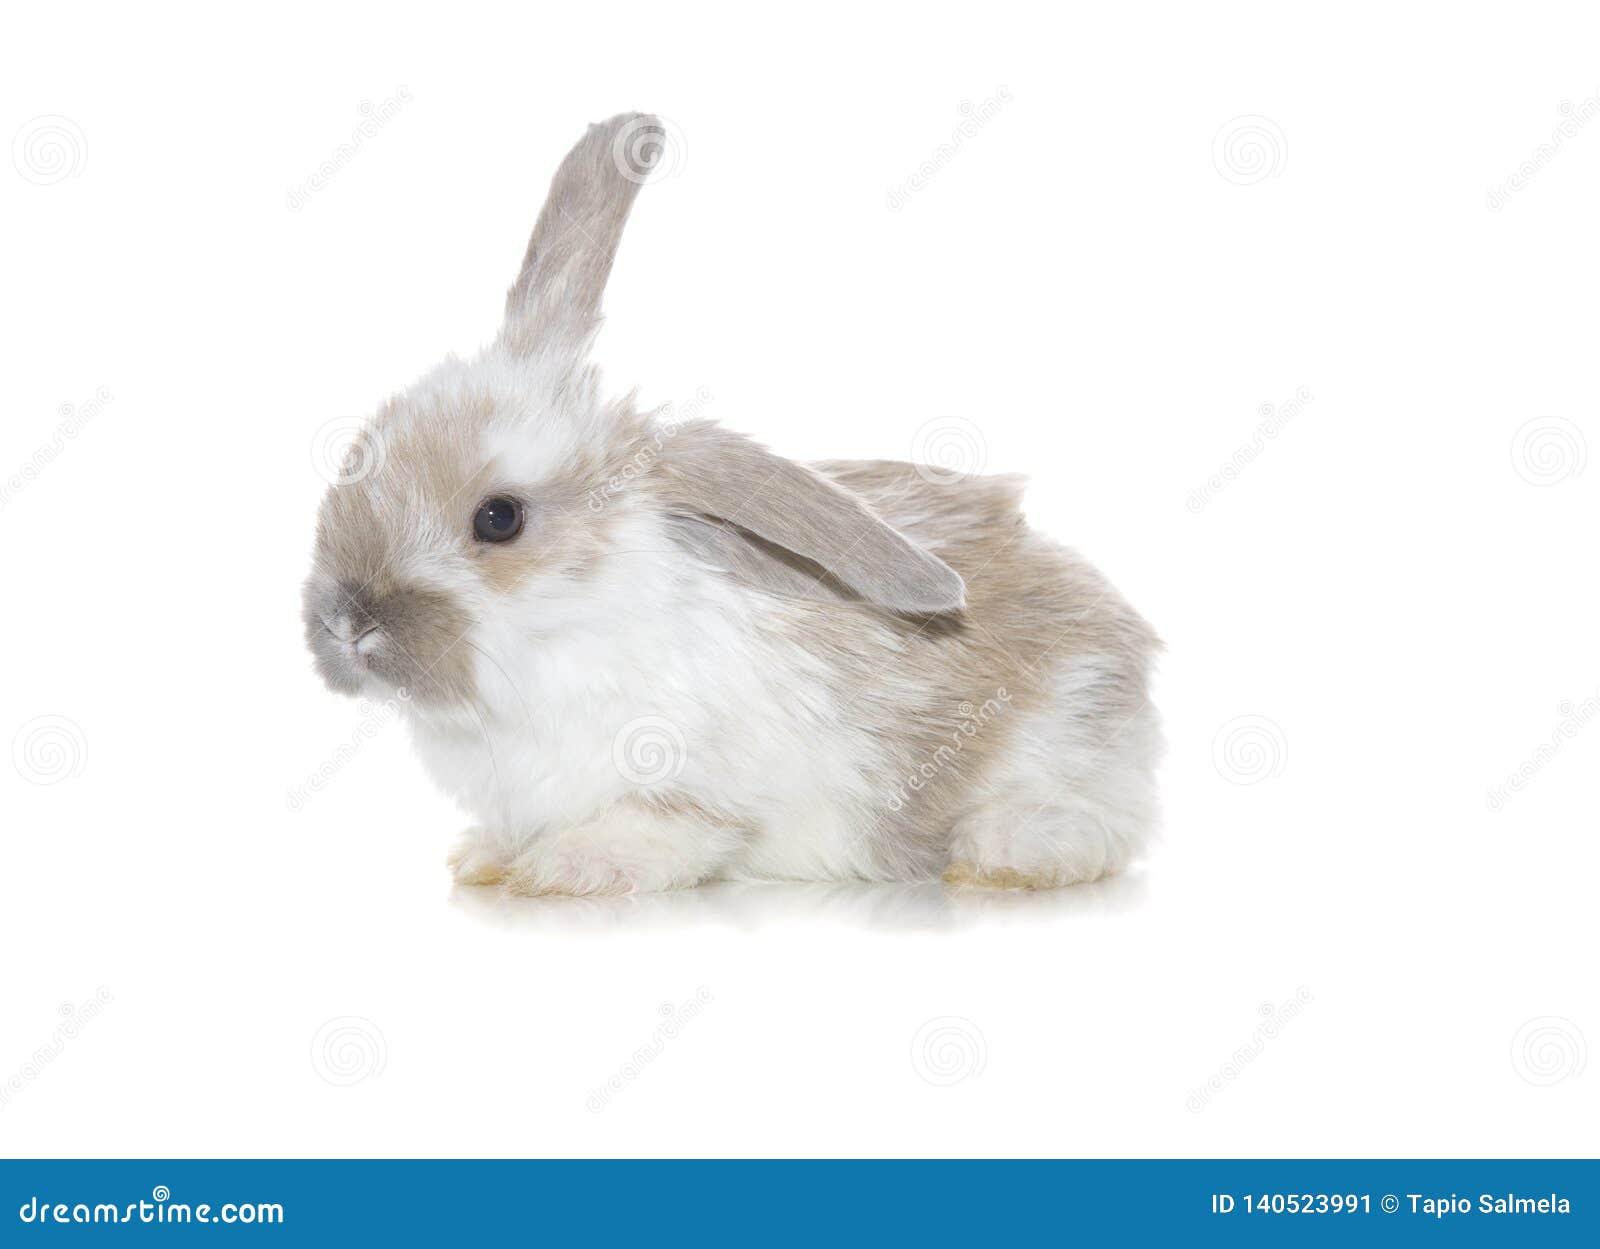 Baby Bunny Cuteness